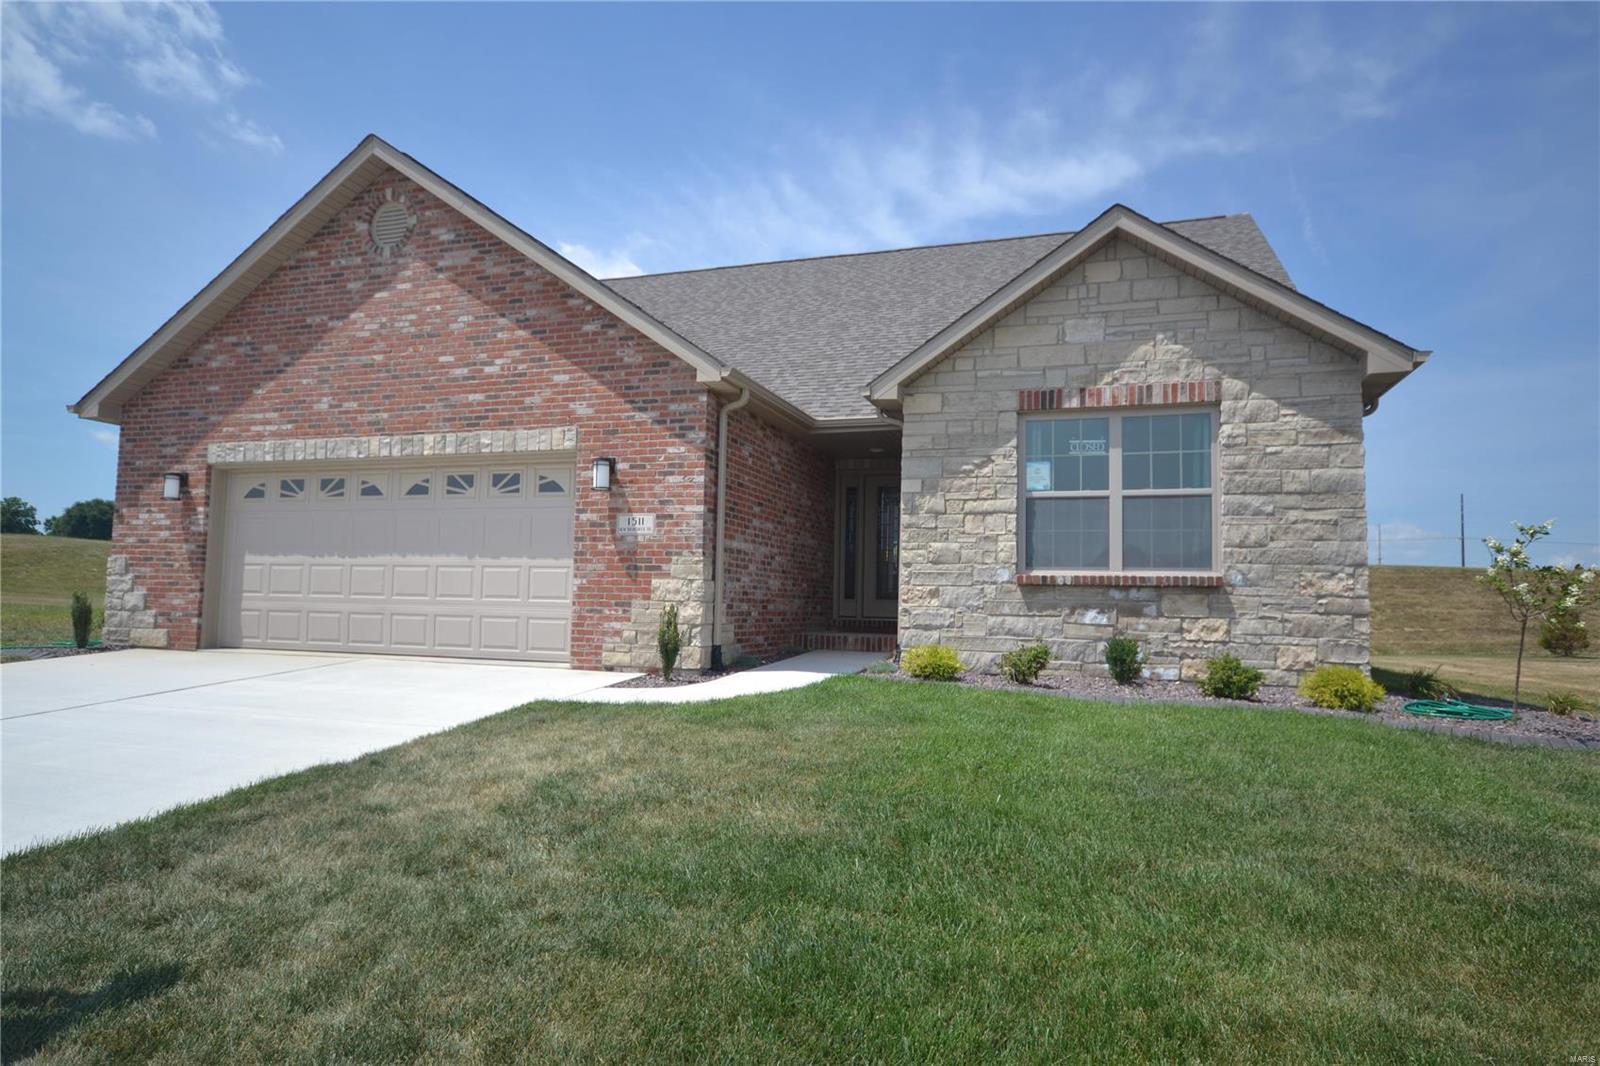 4400 TBB Devin Drive Property Photo - Smithton, IL real estate listing